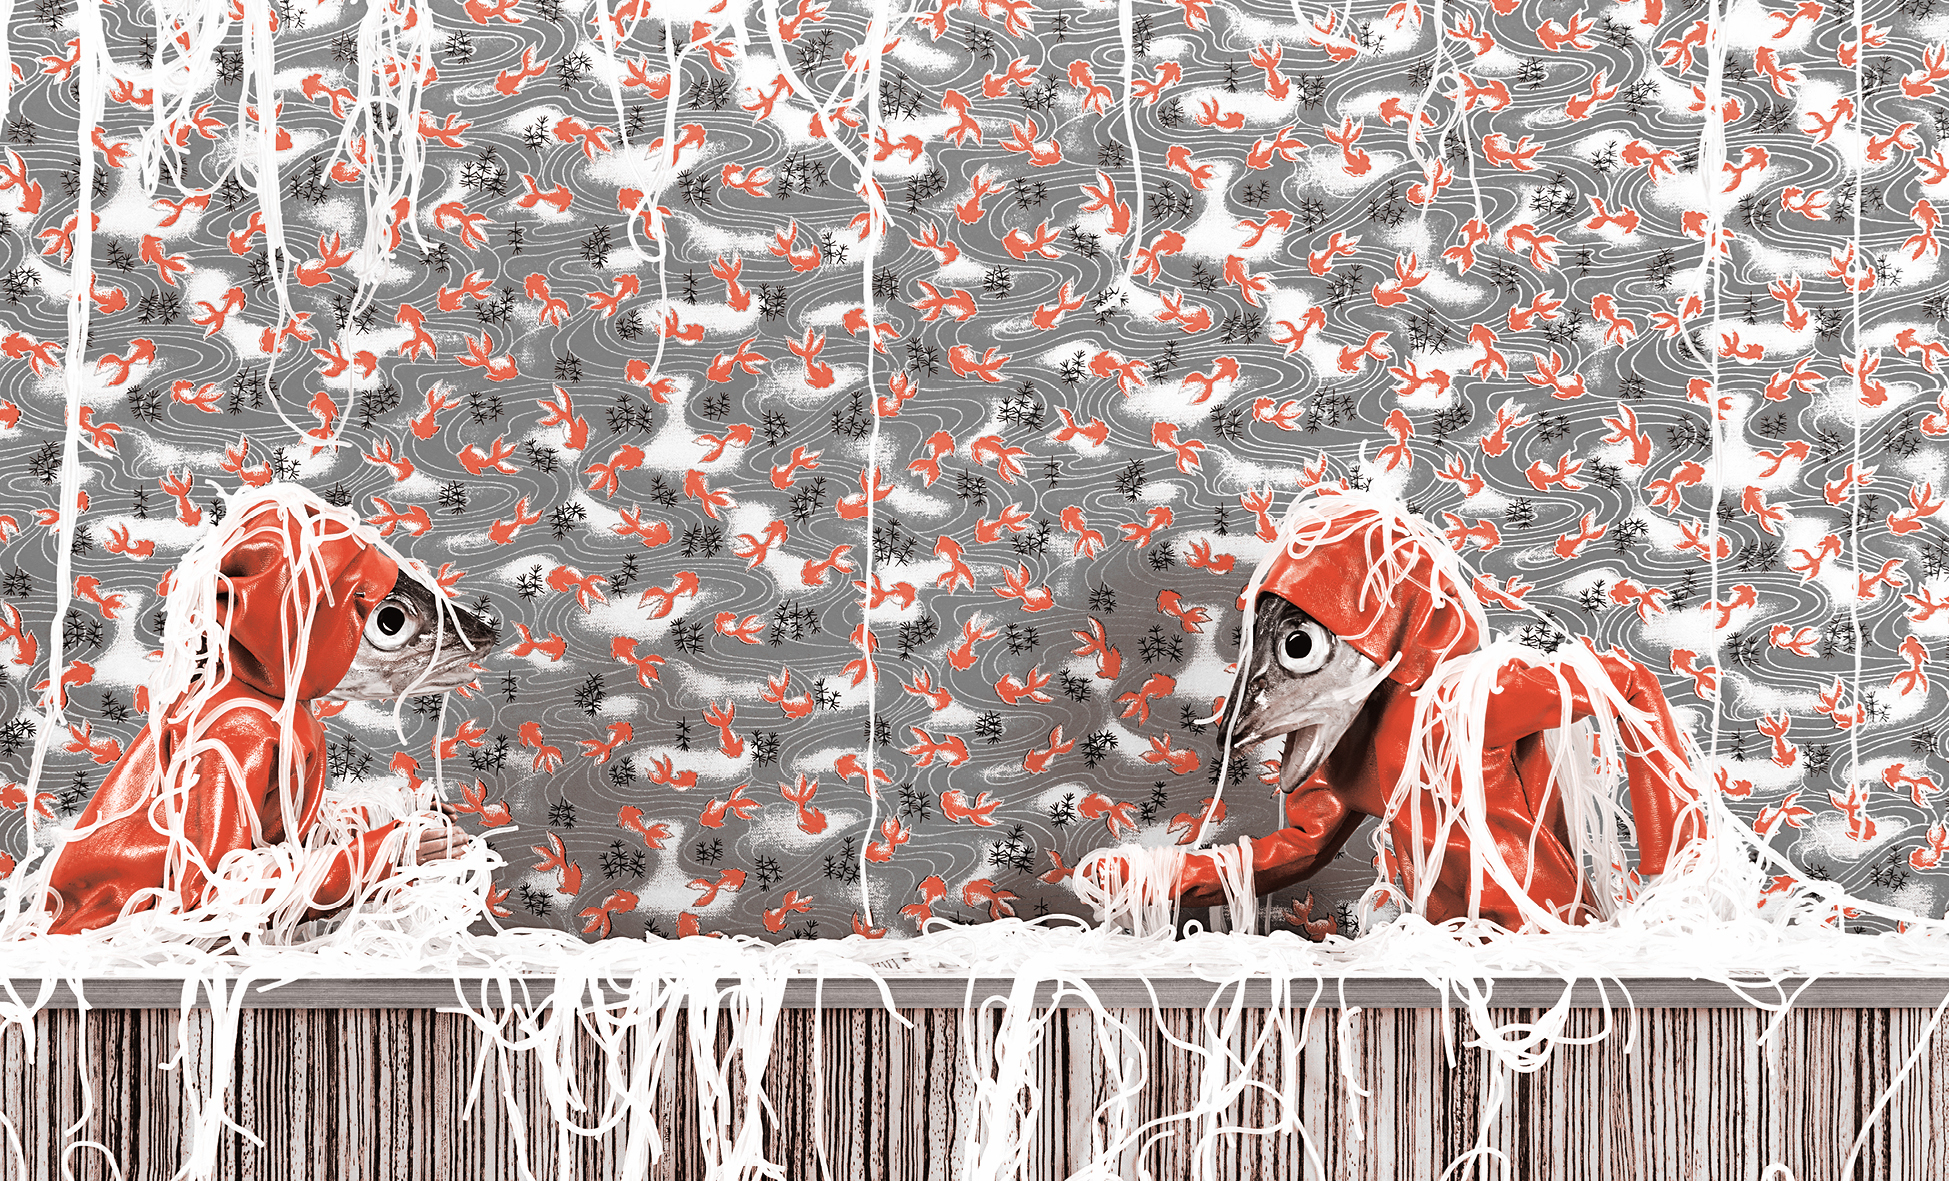 Icônes 80. ACBE/Johann Hauser/Óscar Fernando Morales/Janko Domsic/Szabolcs Bozó/Giovanni Bosco/Dwight Mackintosh/José Manuel Egea/Alberto Jorge Cadi/Louis Bec/Guo Fengyi/Davood Koochaki/Mihai Zgondoiu/